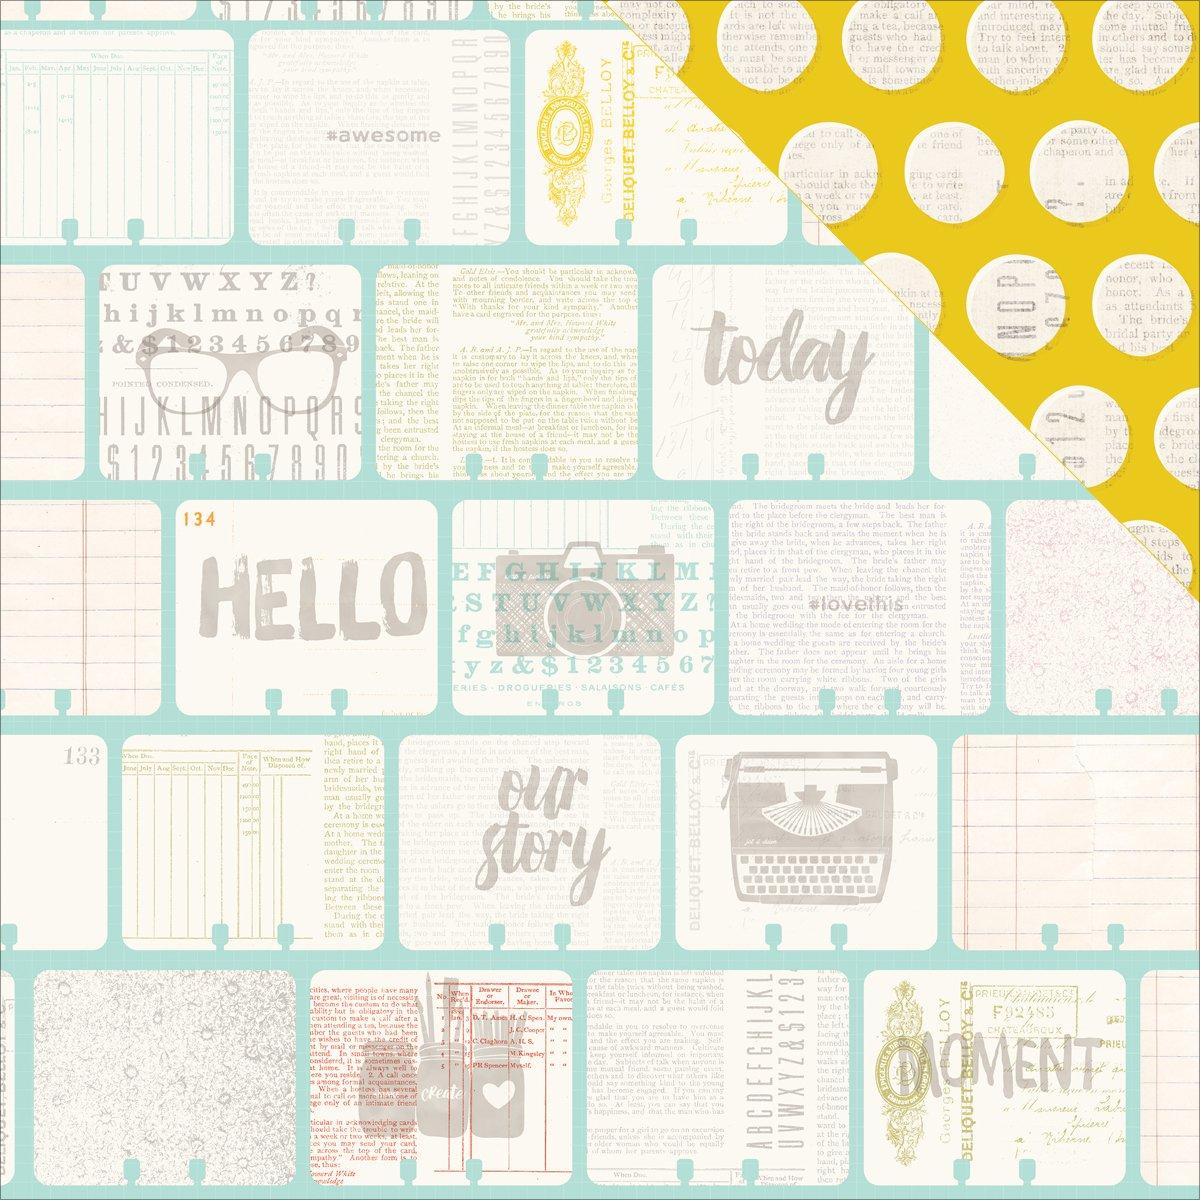 American Crafts Ledger-Memorandum DS Papier, Acryl, Mehrfarbig B016QUH2OO | Spezielle Funktion